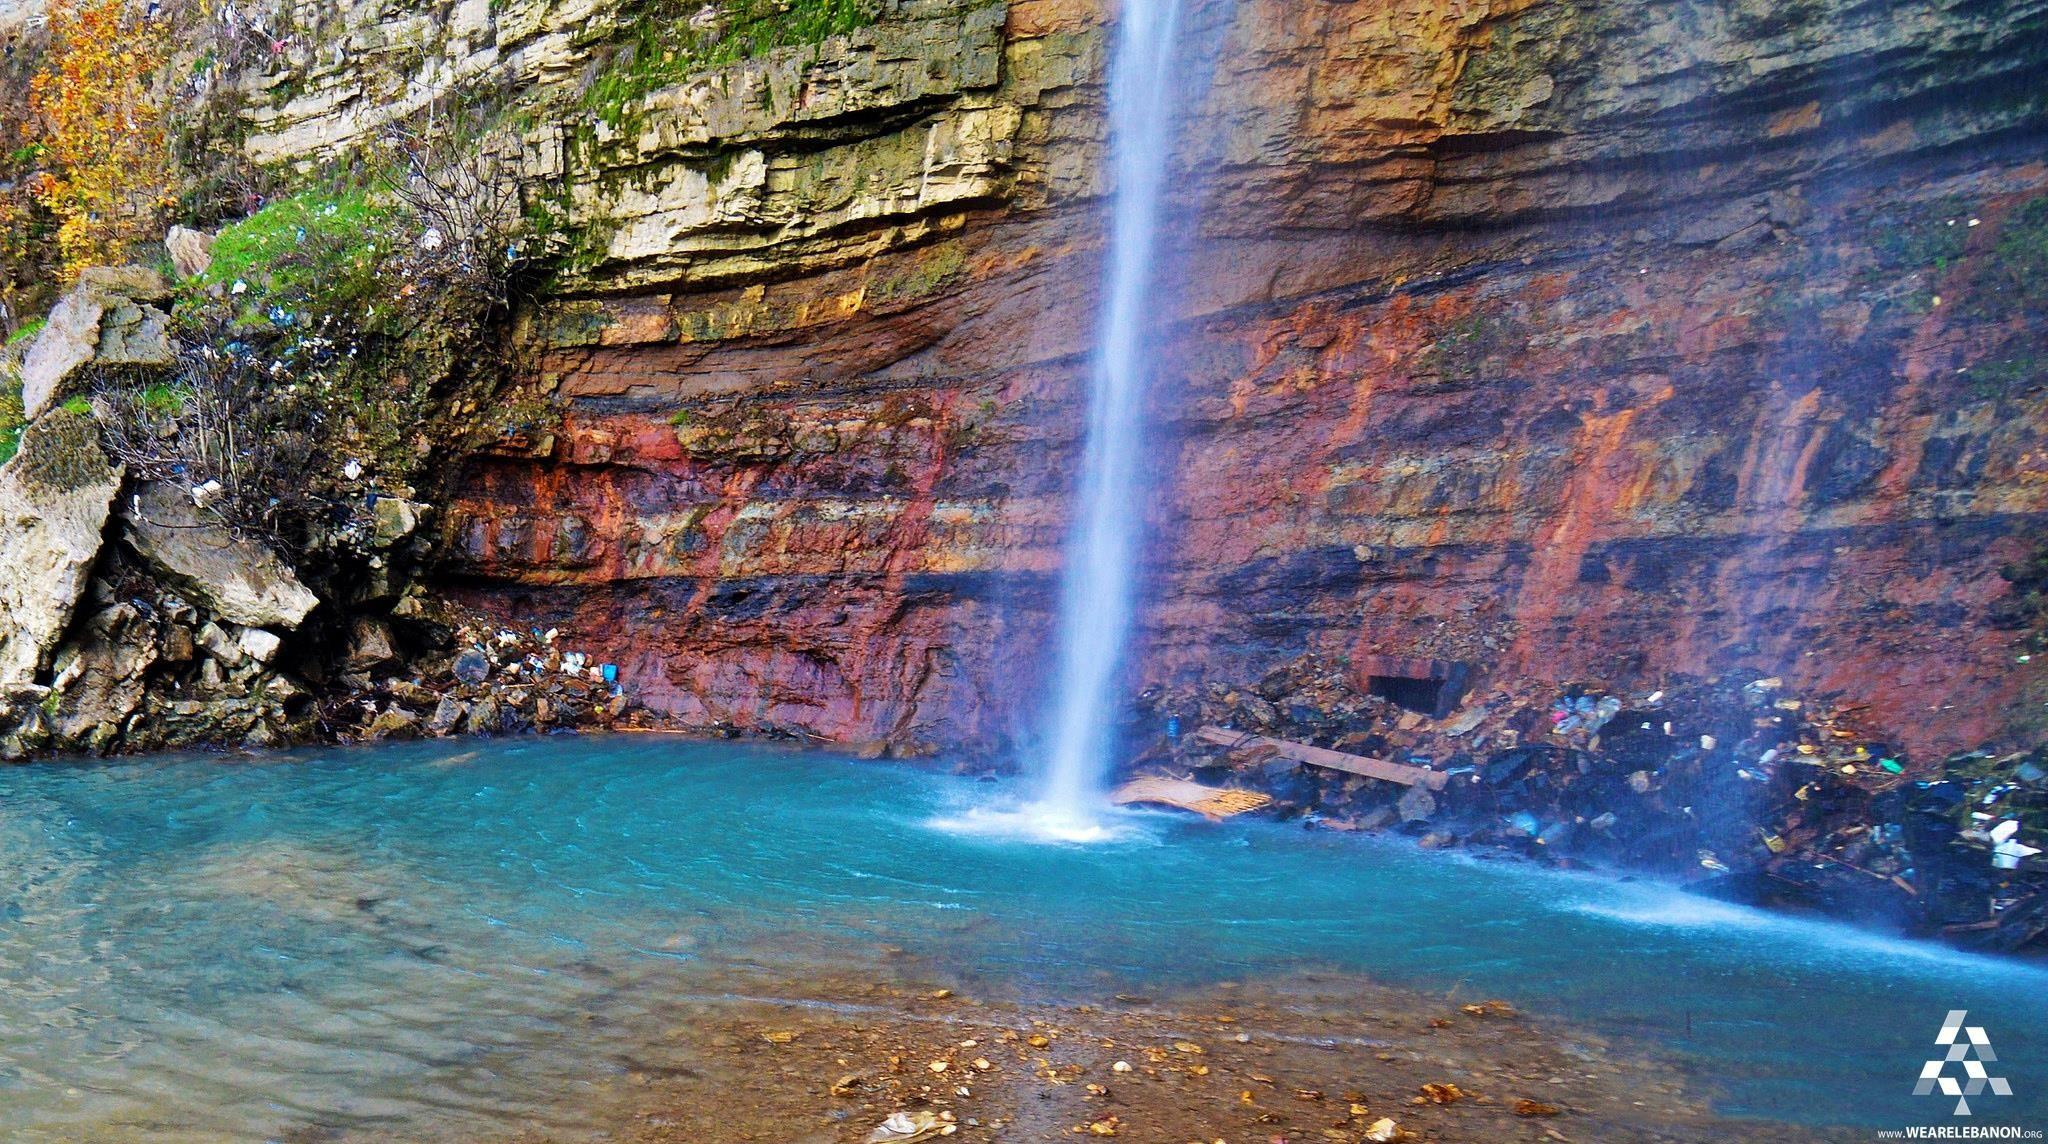 The beautifull #Jezzine waterfall شلال جزين الرائع By Ibrahim Anouti #Lebanon #WeAreLebanon